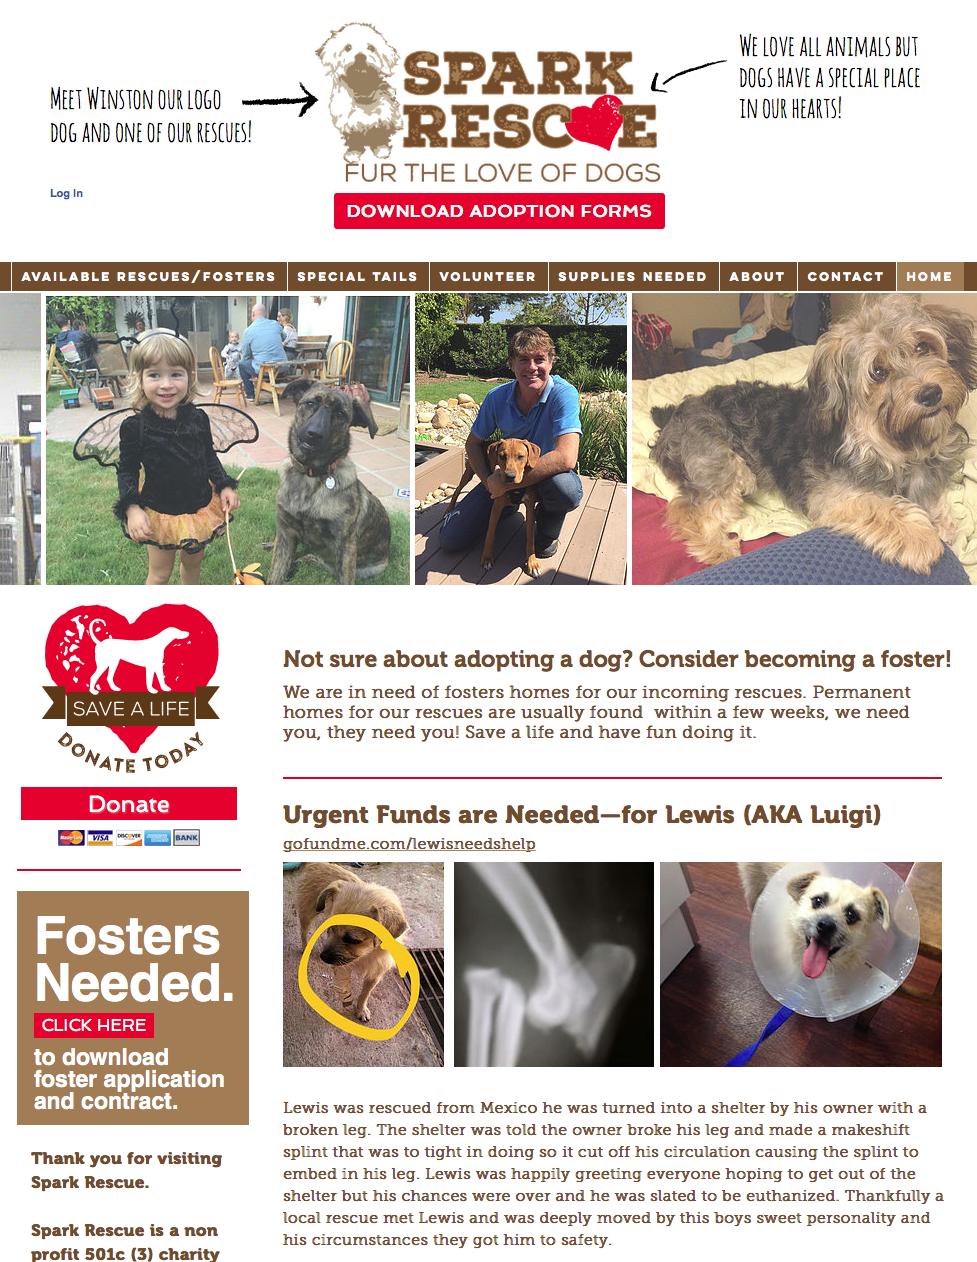 Spark Rescue website design